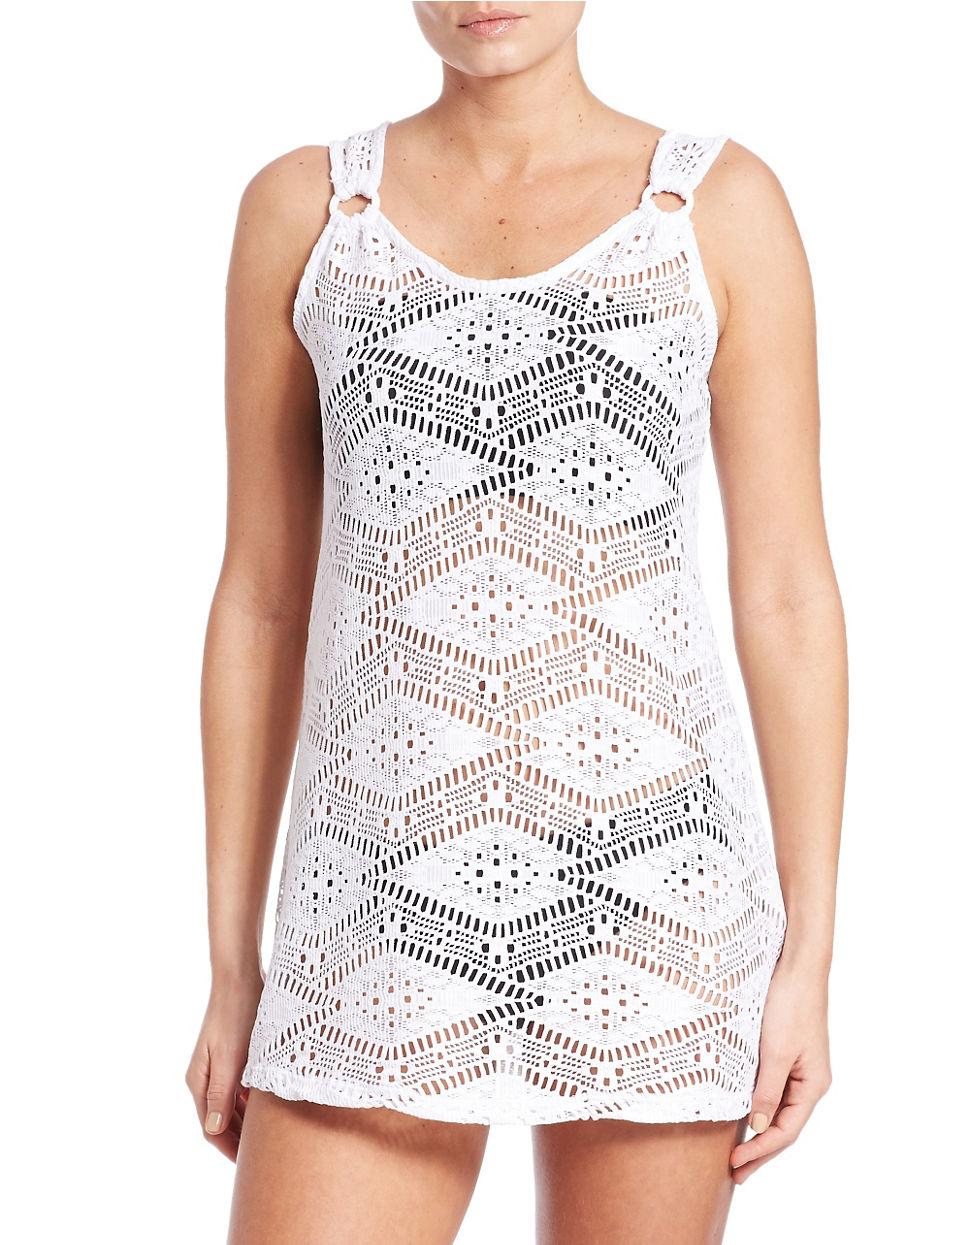 630d6892b4 J Valdi Diamond Crochet Ring Tank Cover-up in White - Lyst